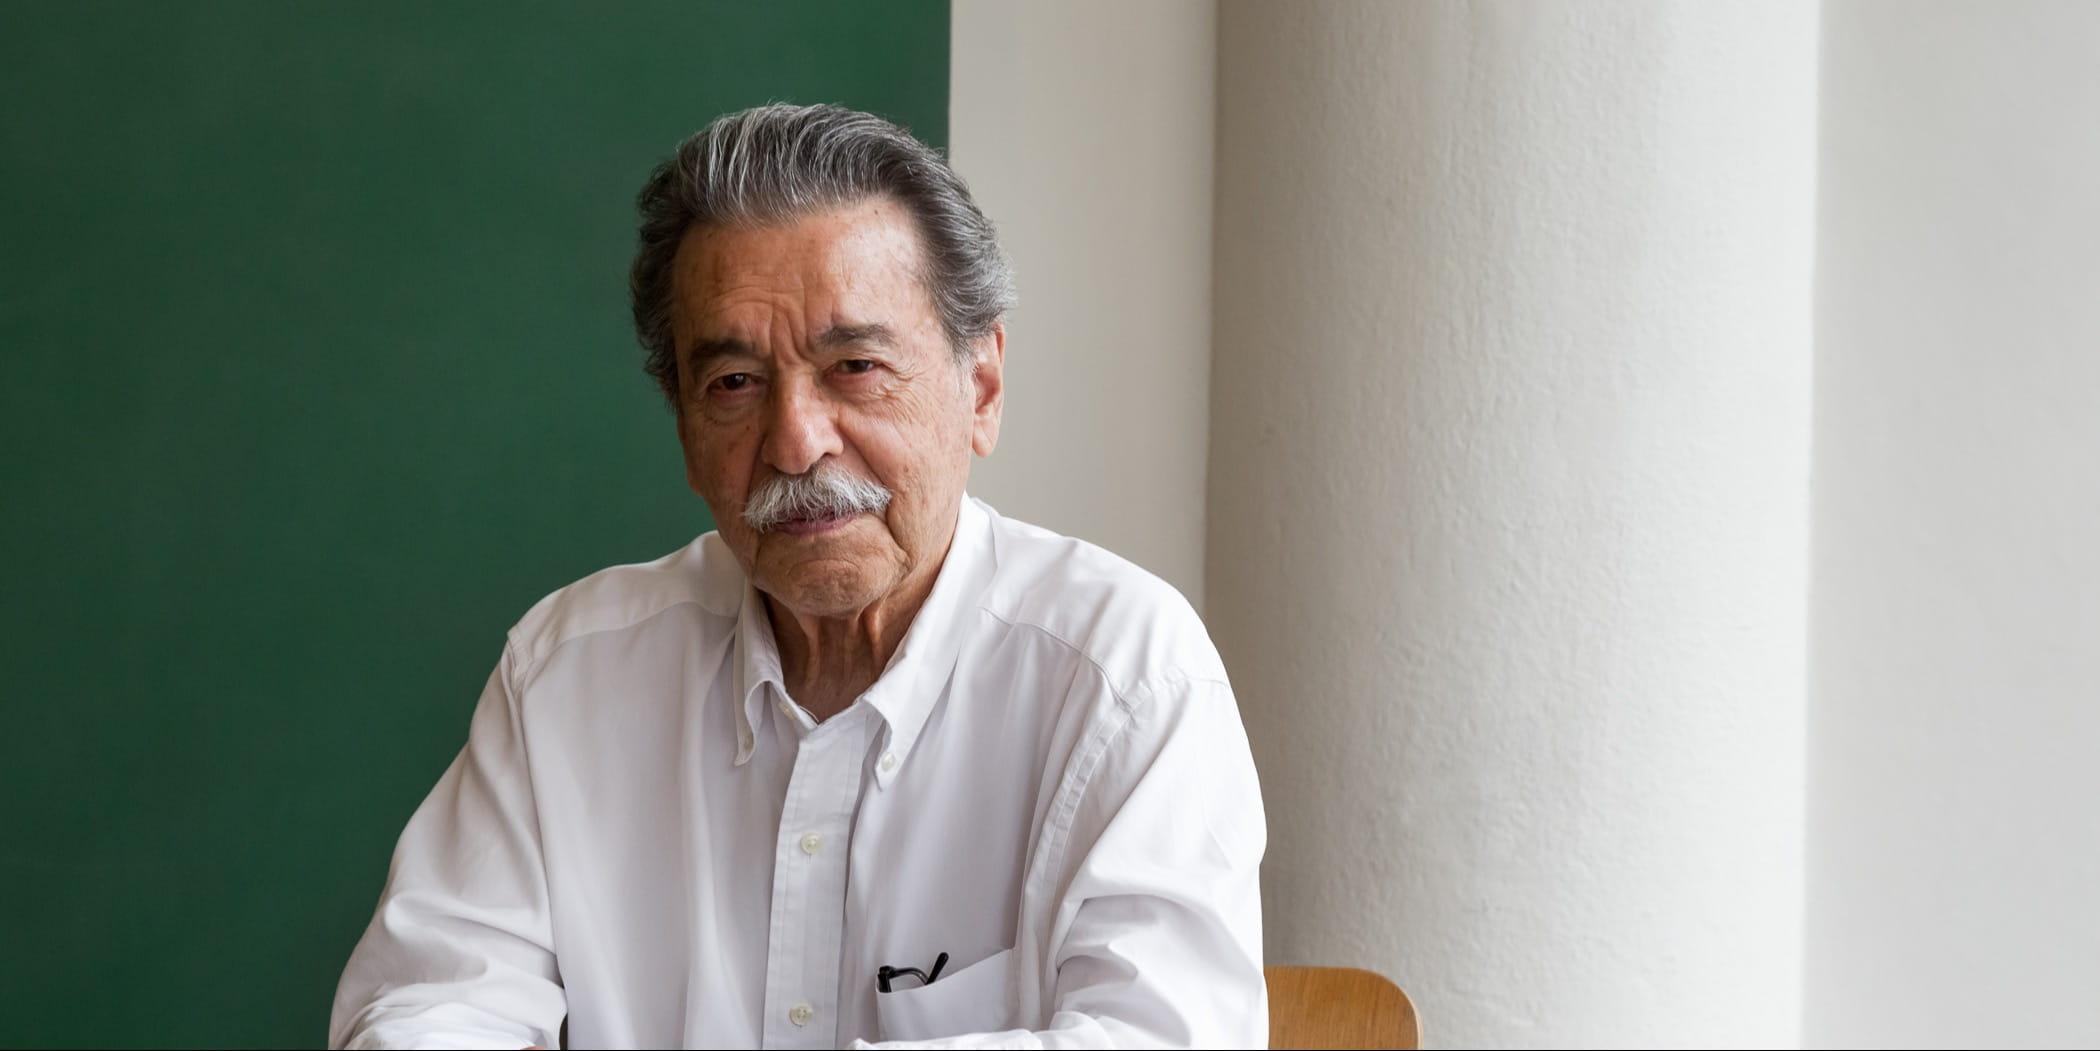 Paulo Mendes da Rocha, giant of the Brazilian architecture world dies at 92